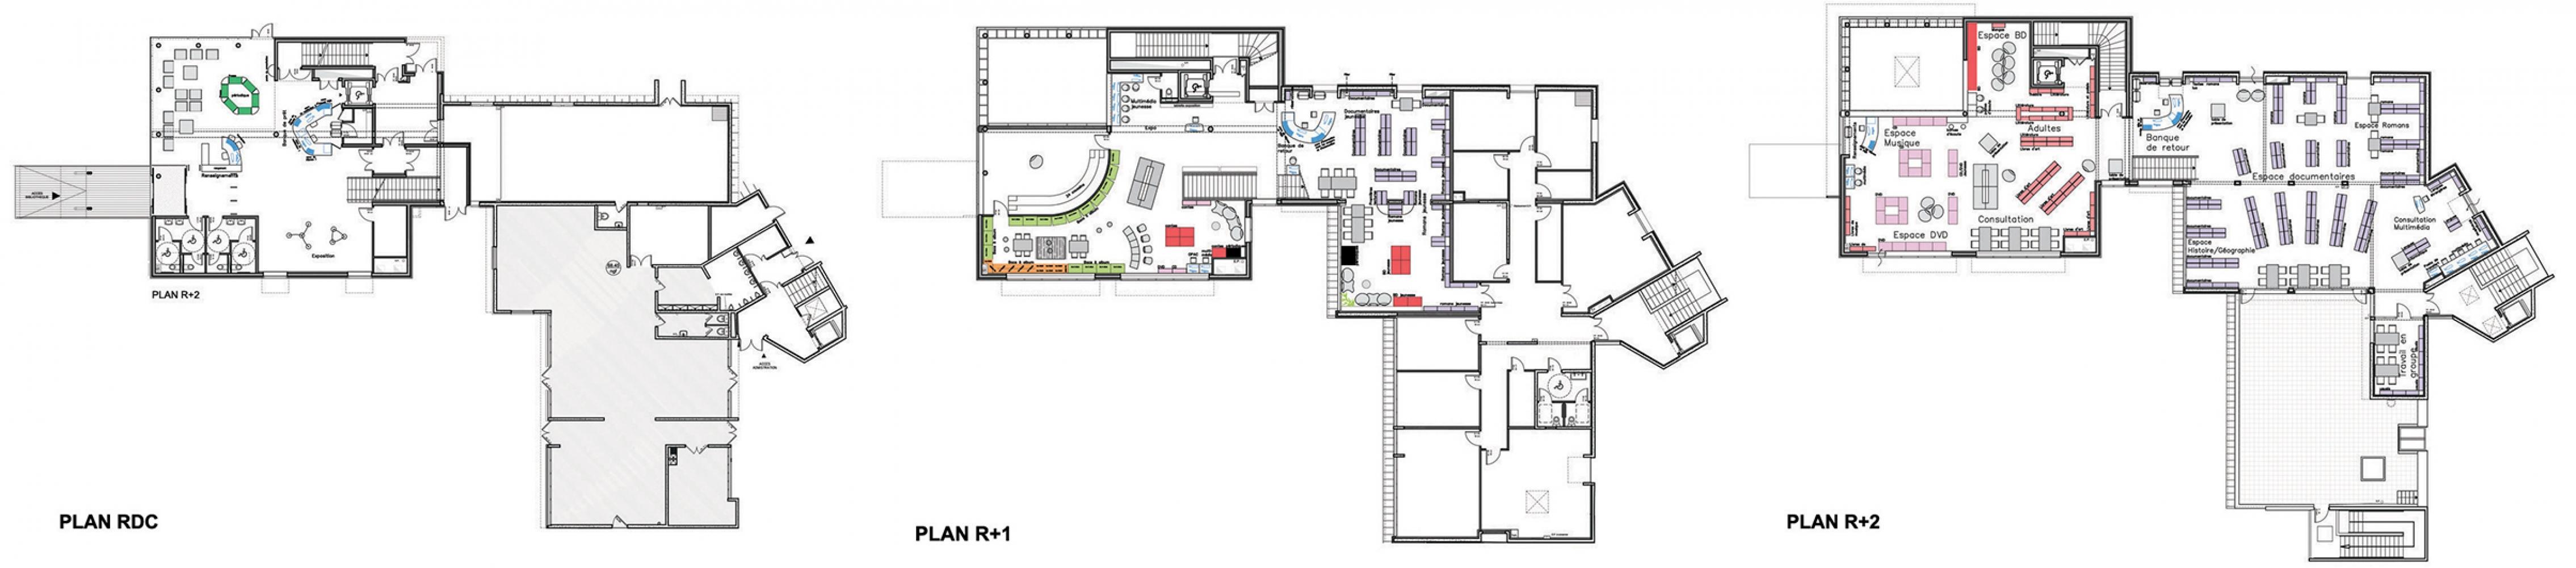 plan_massy Pascale SEURIN Architecte - Culturel